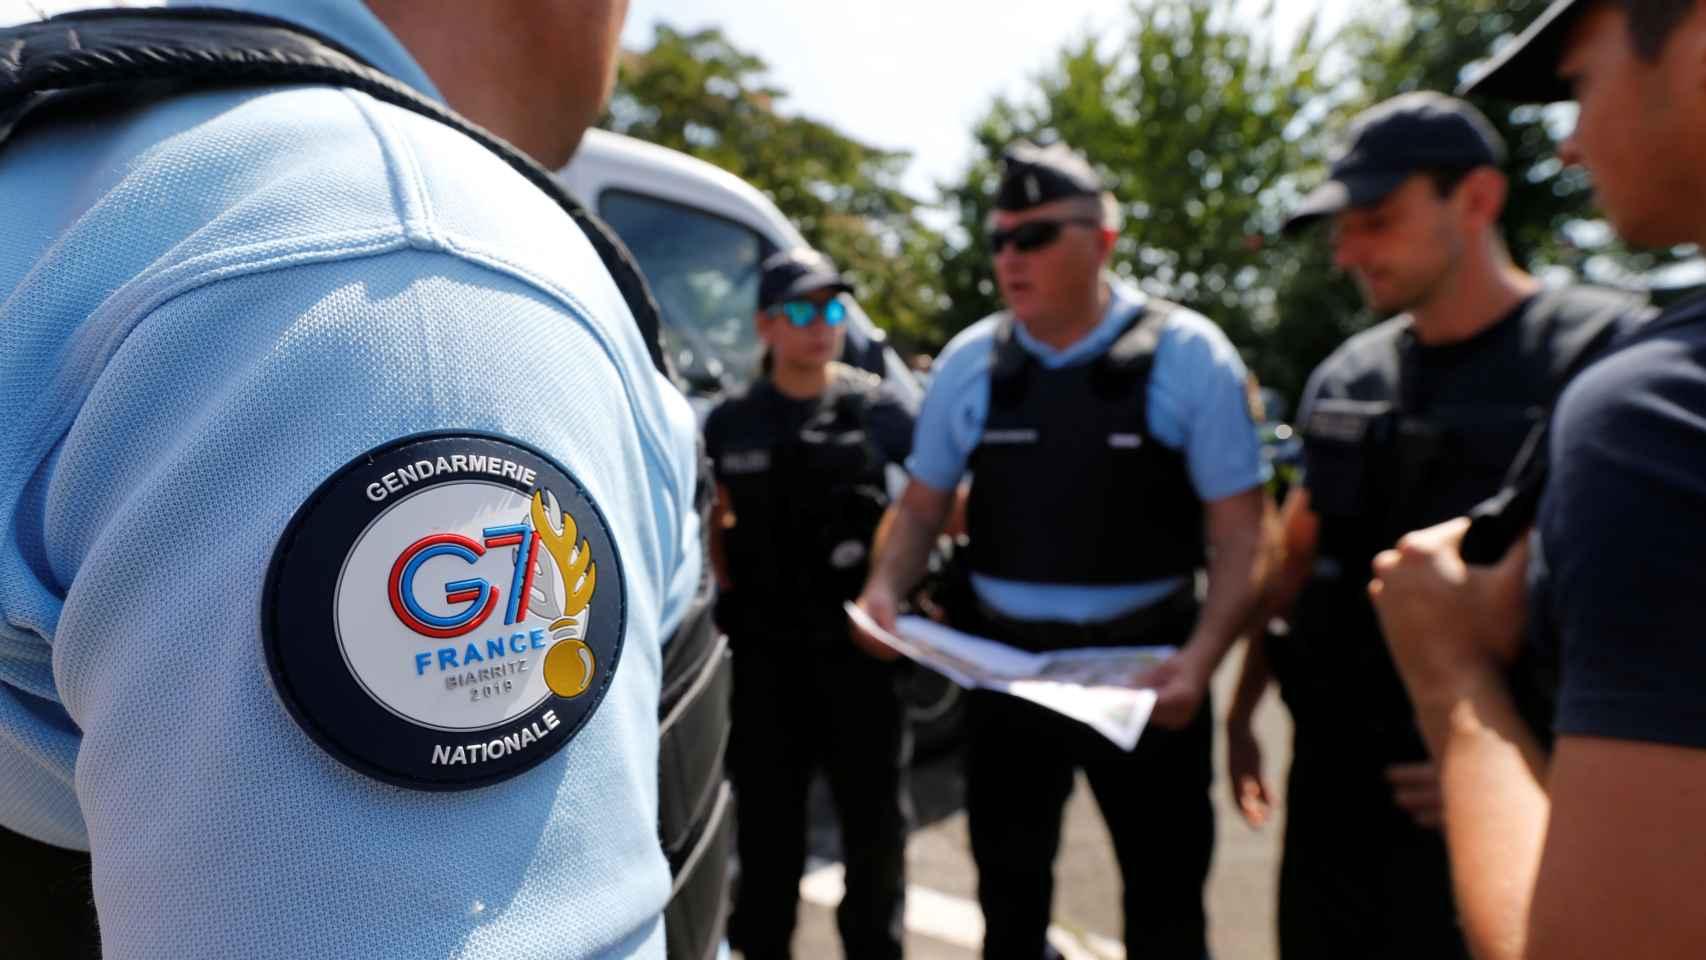 Biarritz, blindada para proteger a los líderes mundiales del G-7